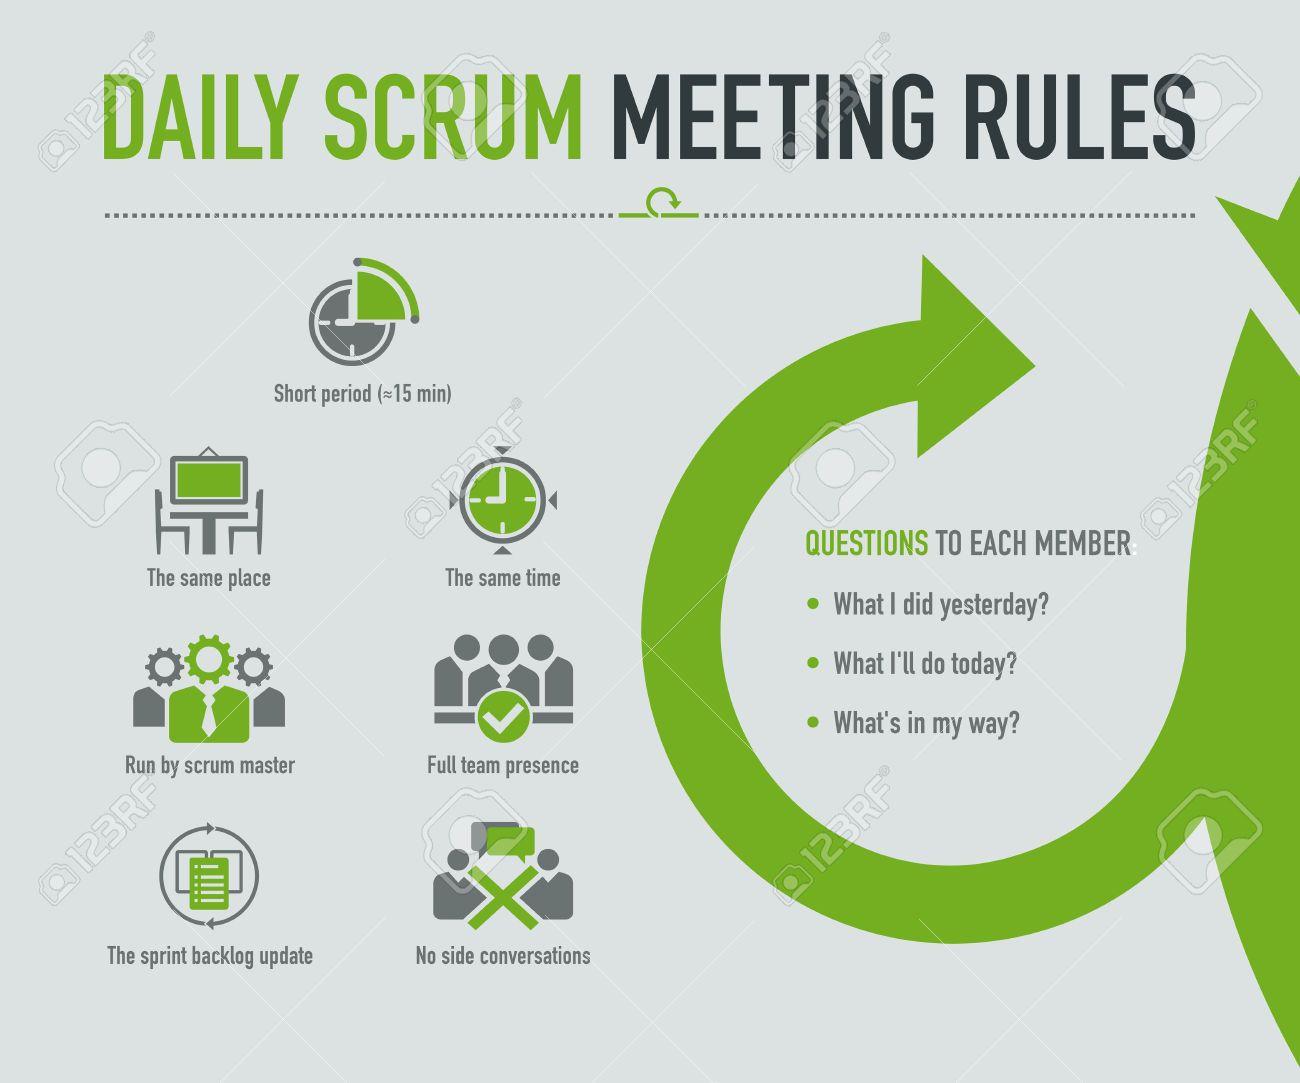 Agile Scrum Project Management Certification pinmatt merlenbach on agile, lean, six sigma | agile